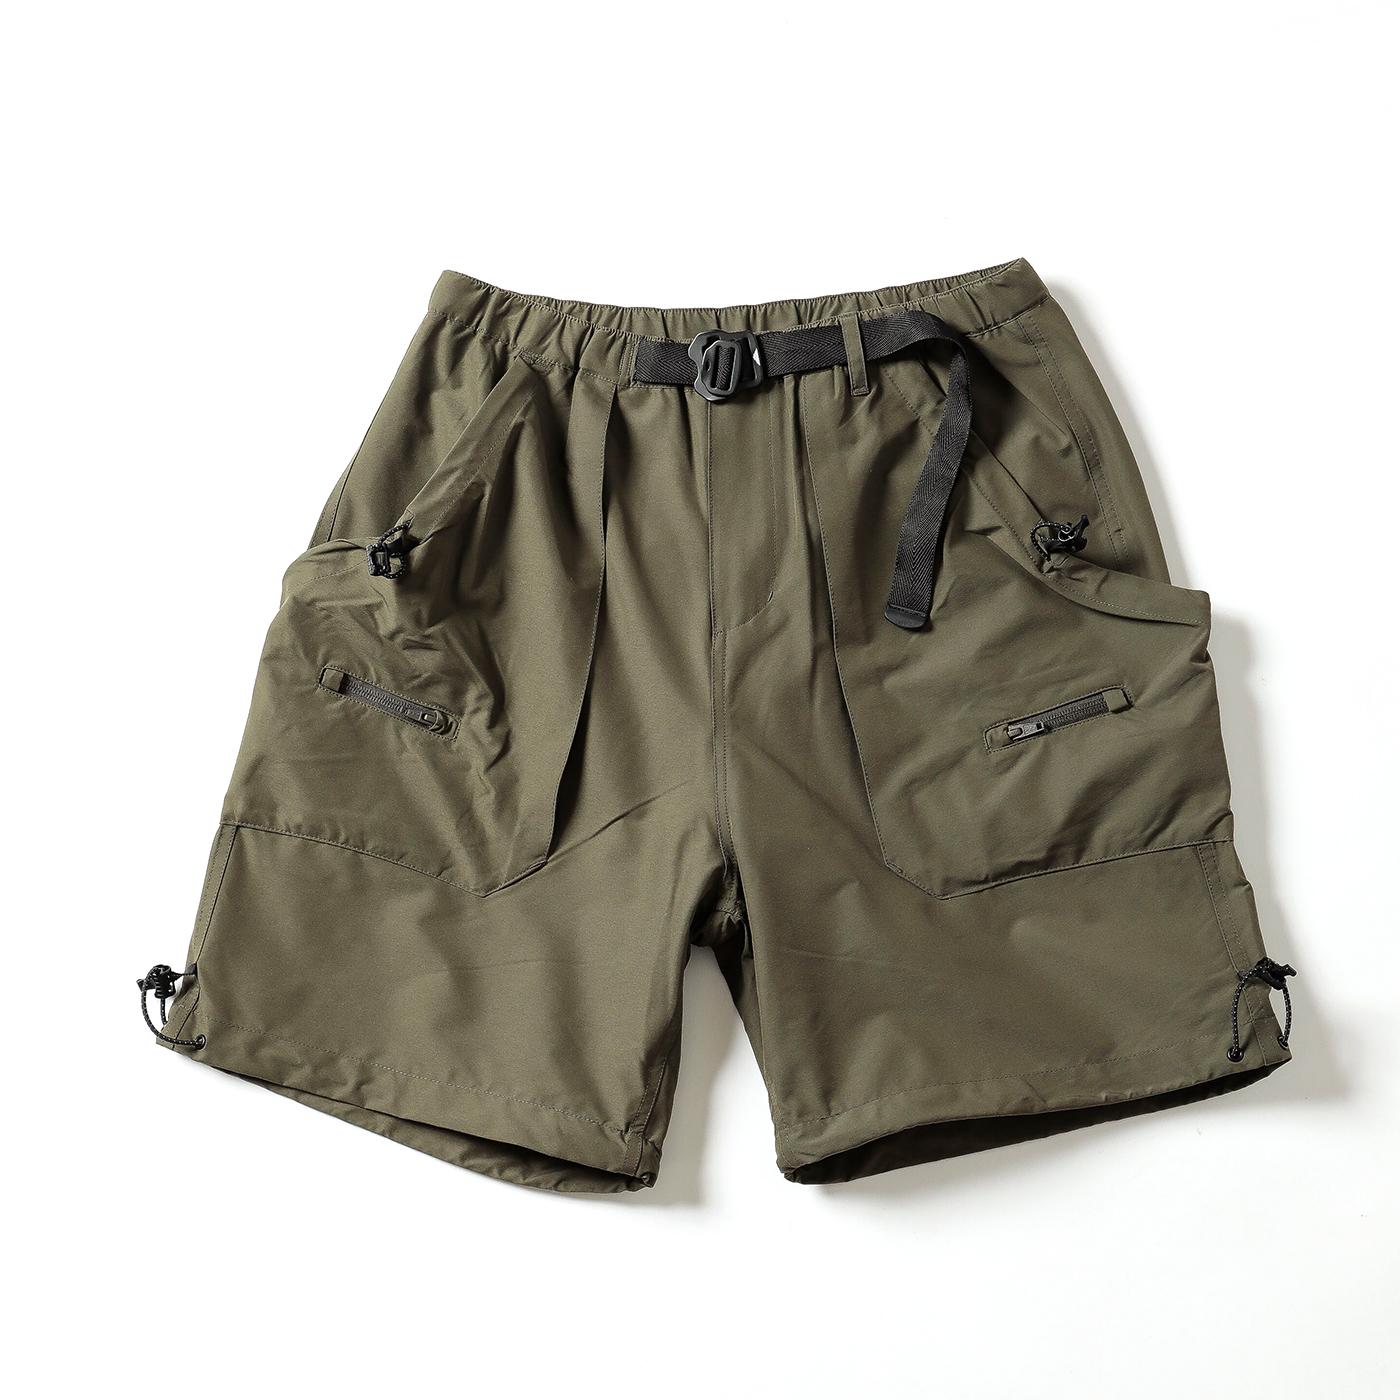 product: Garfield Shorts / color: KHAKI 1